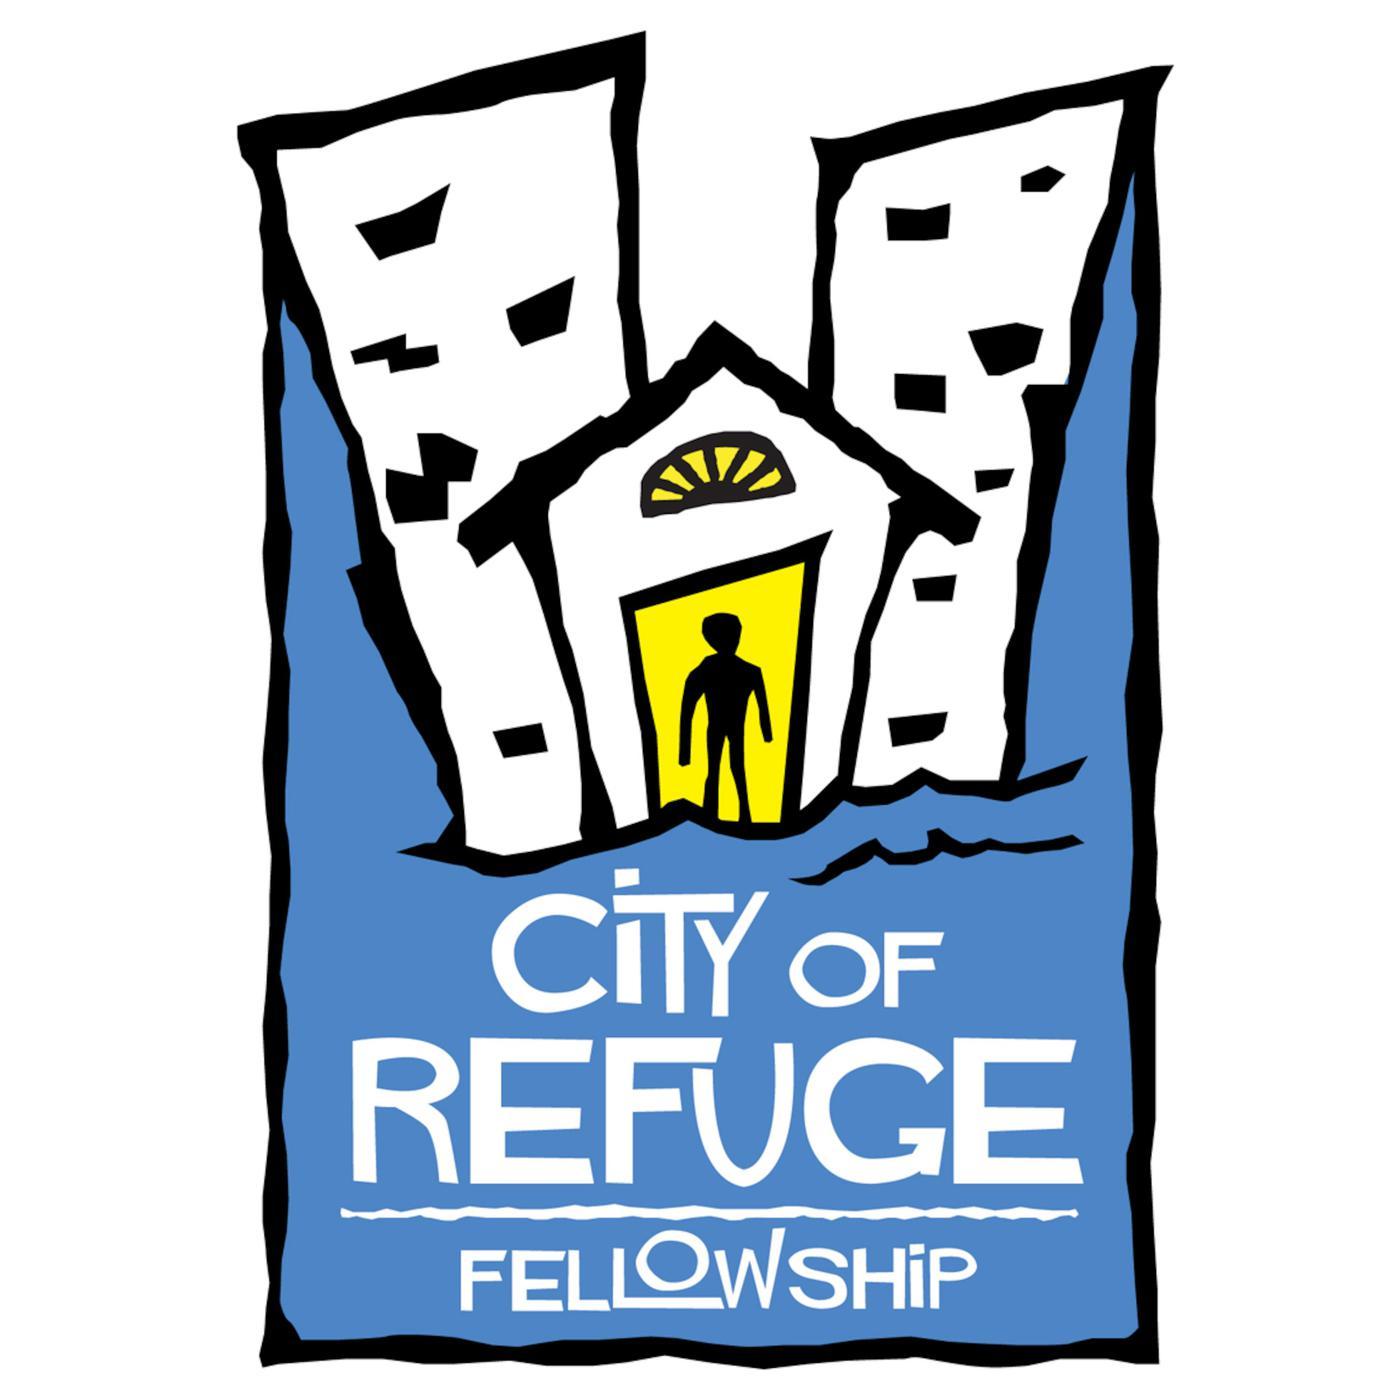 City of Refuge Fellowship (podcast).